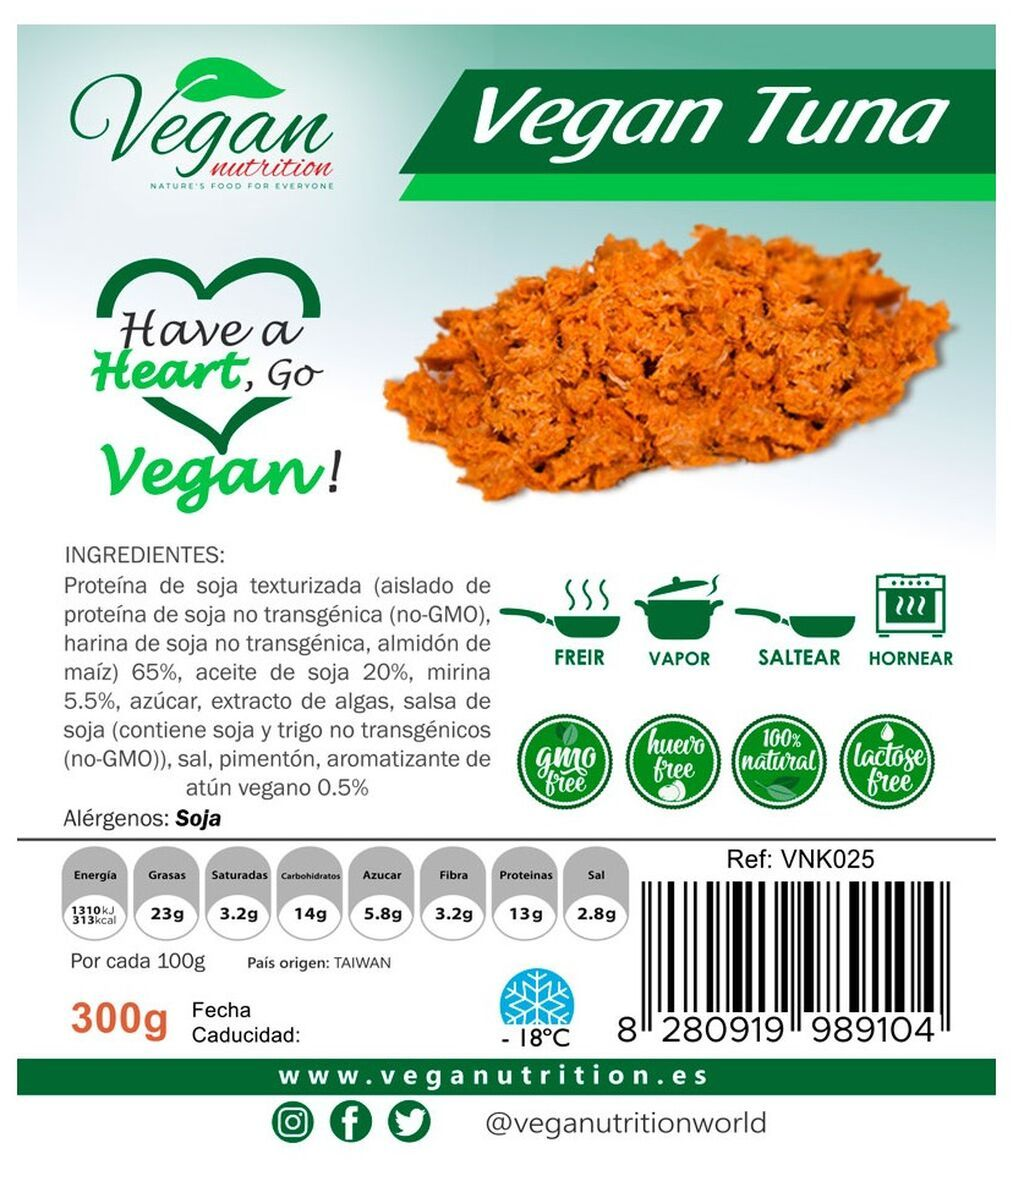 atun-vegano-vegan-nutrition-